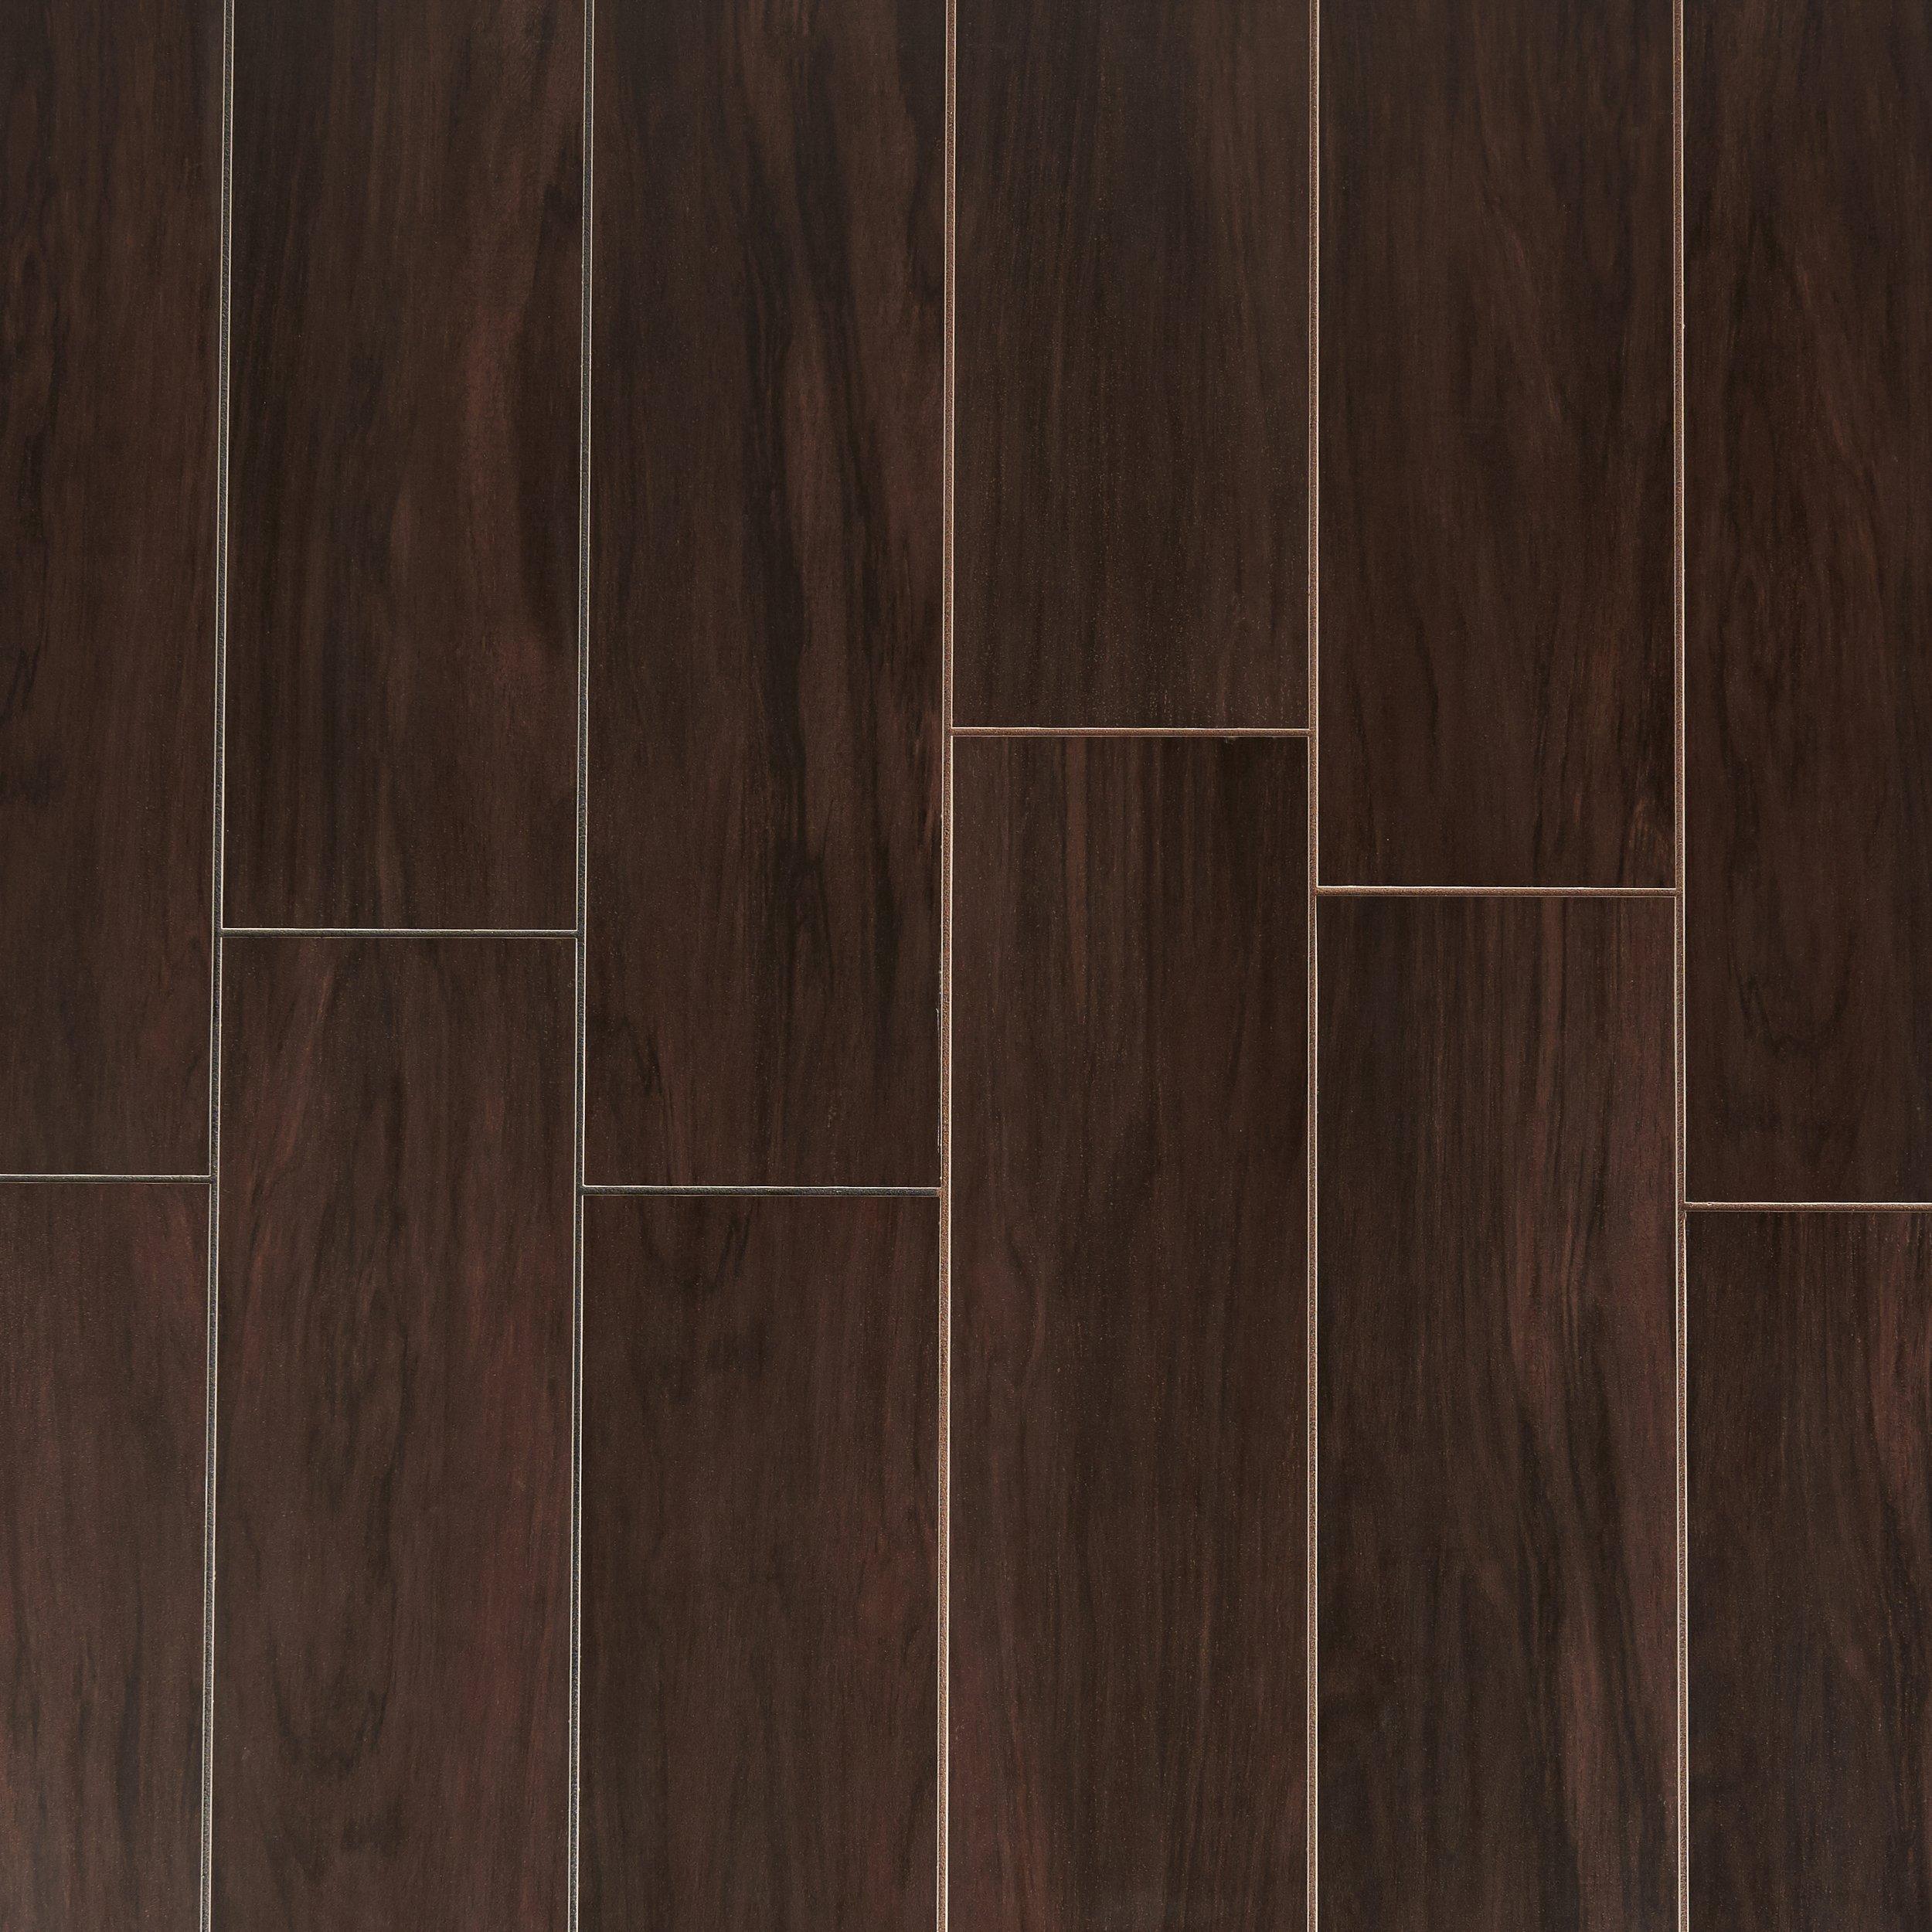 Stockbridge Espresso Wood Plank Porcelain Tile 6 x 24